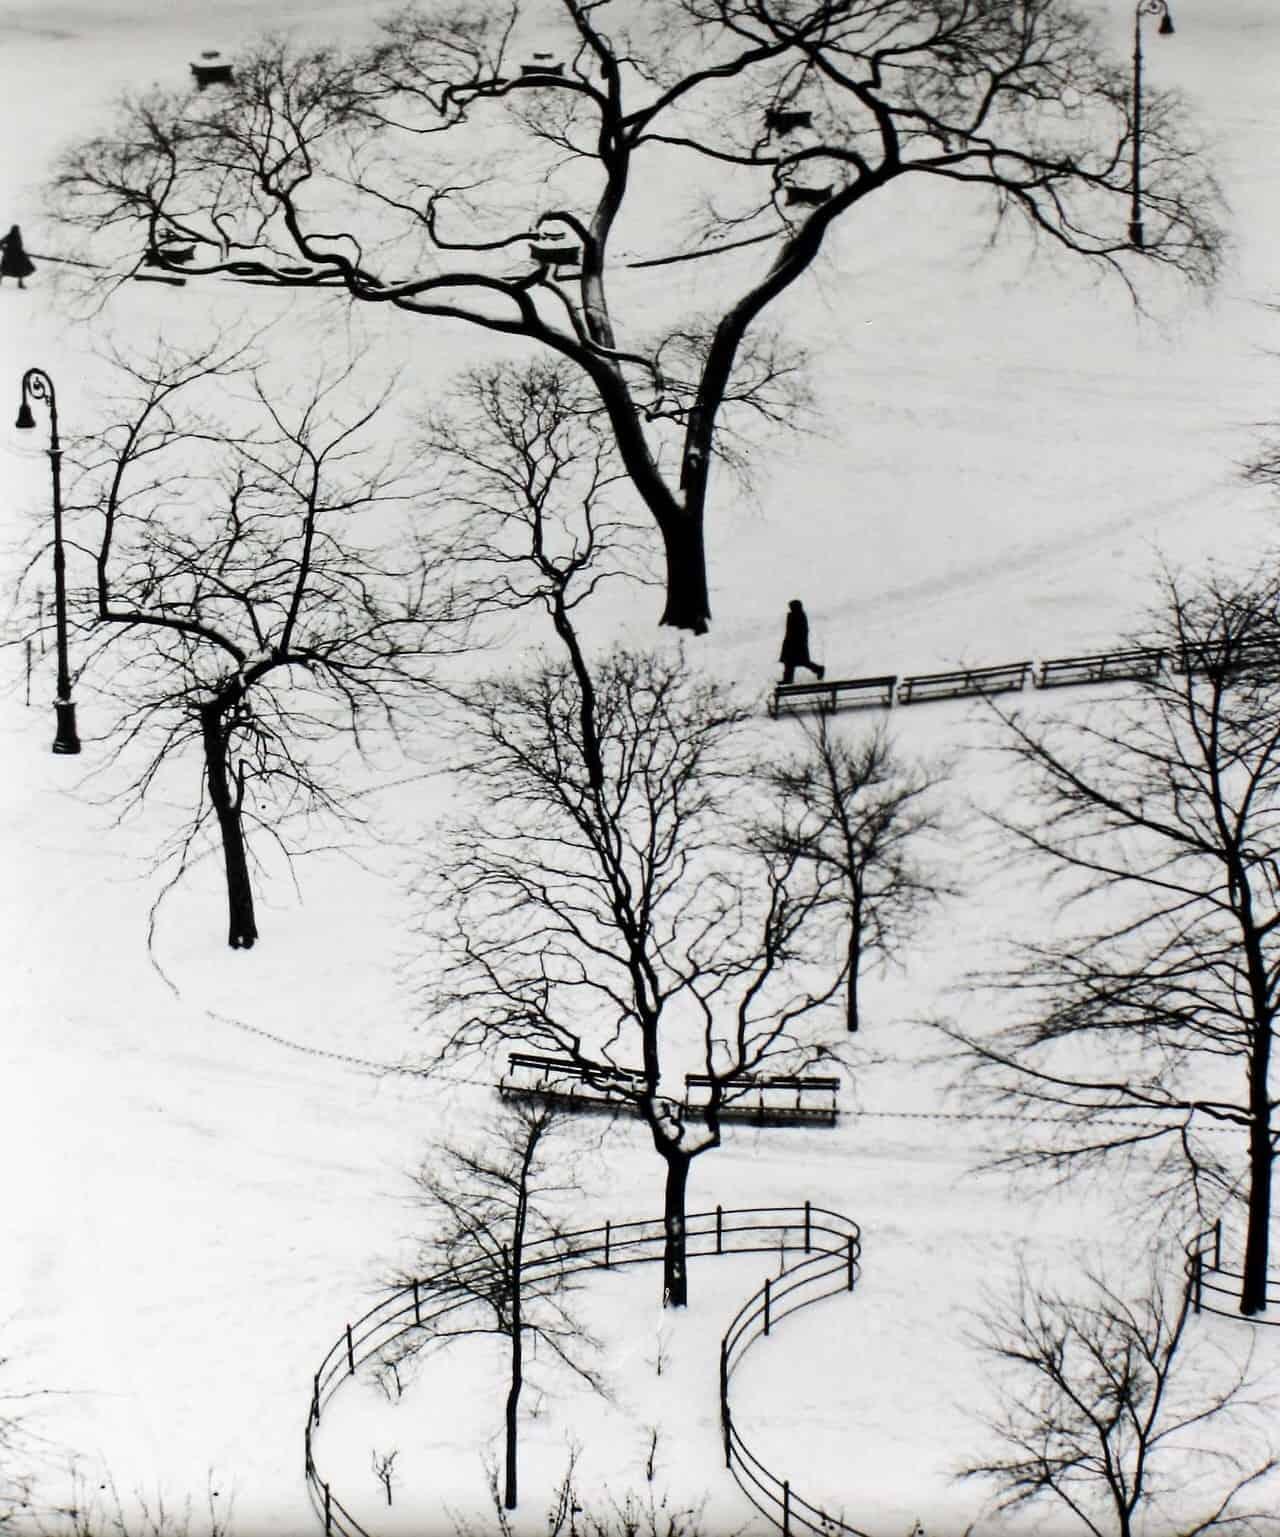 foto: André Kertész, Washington Square. New York. USA (1954)